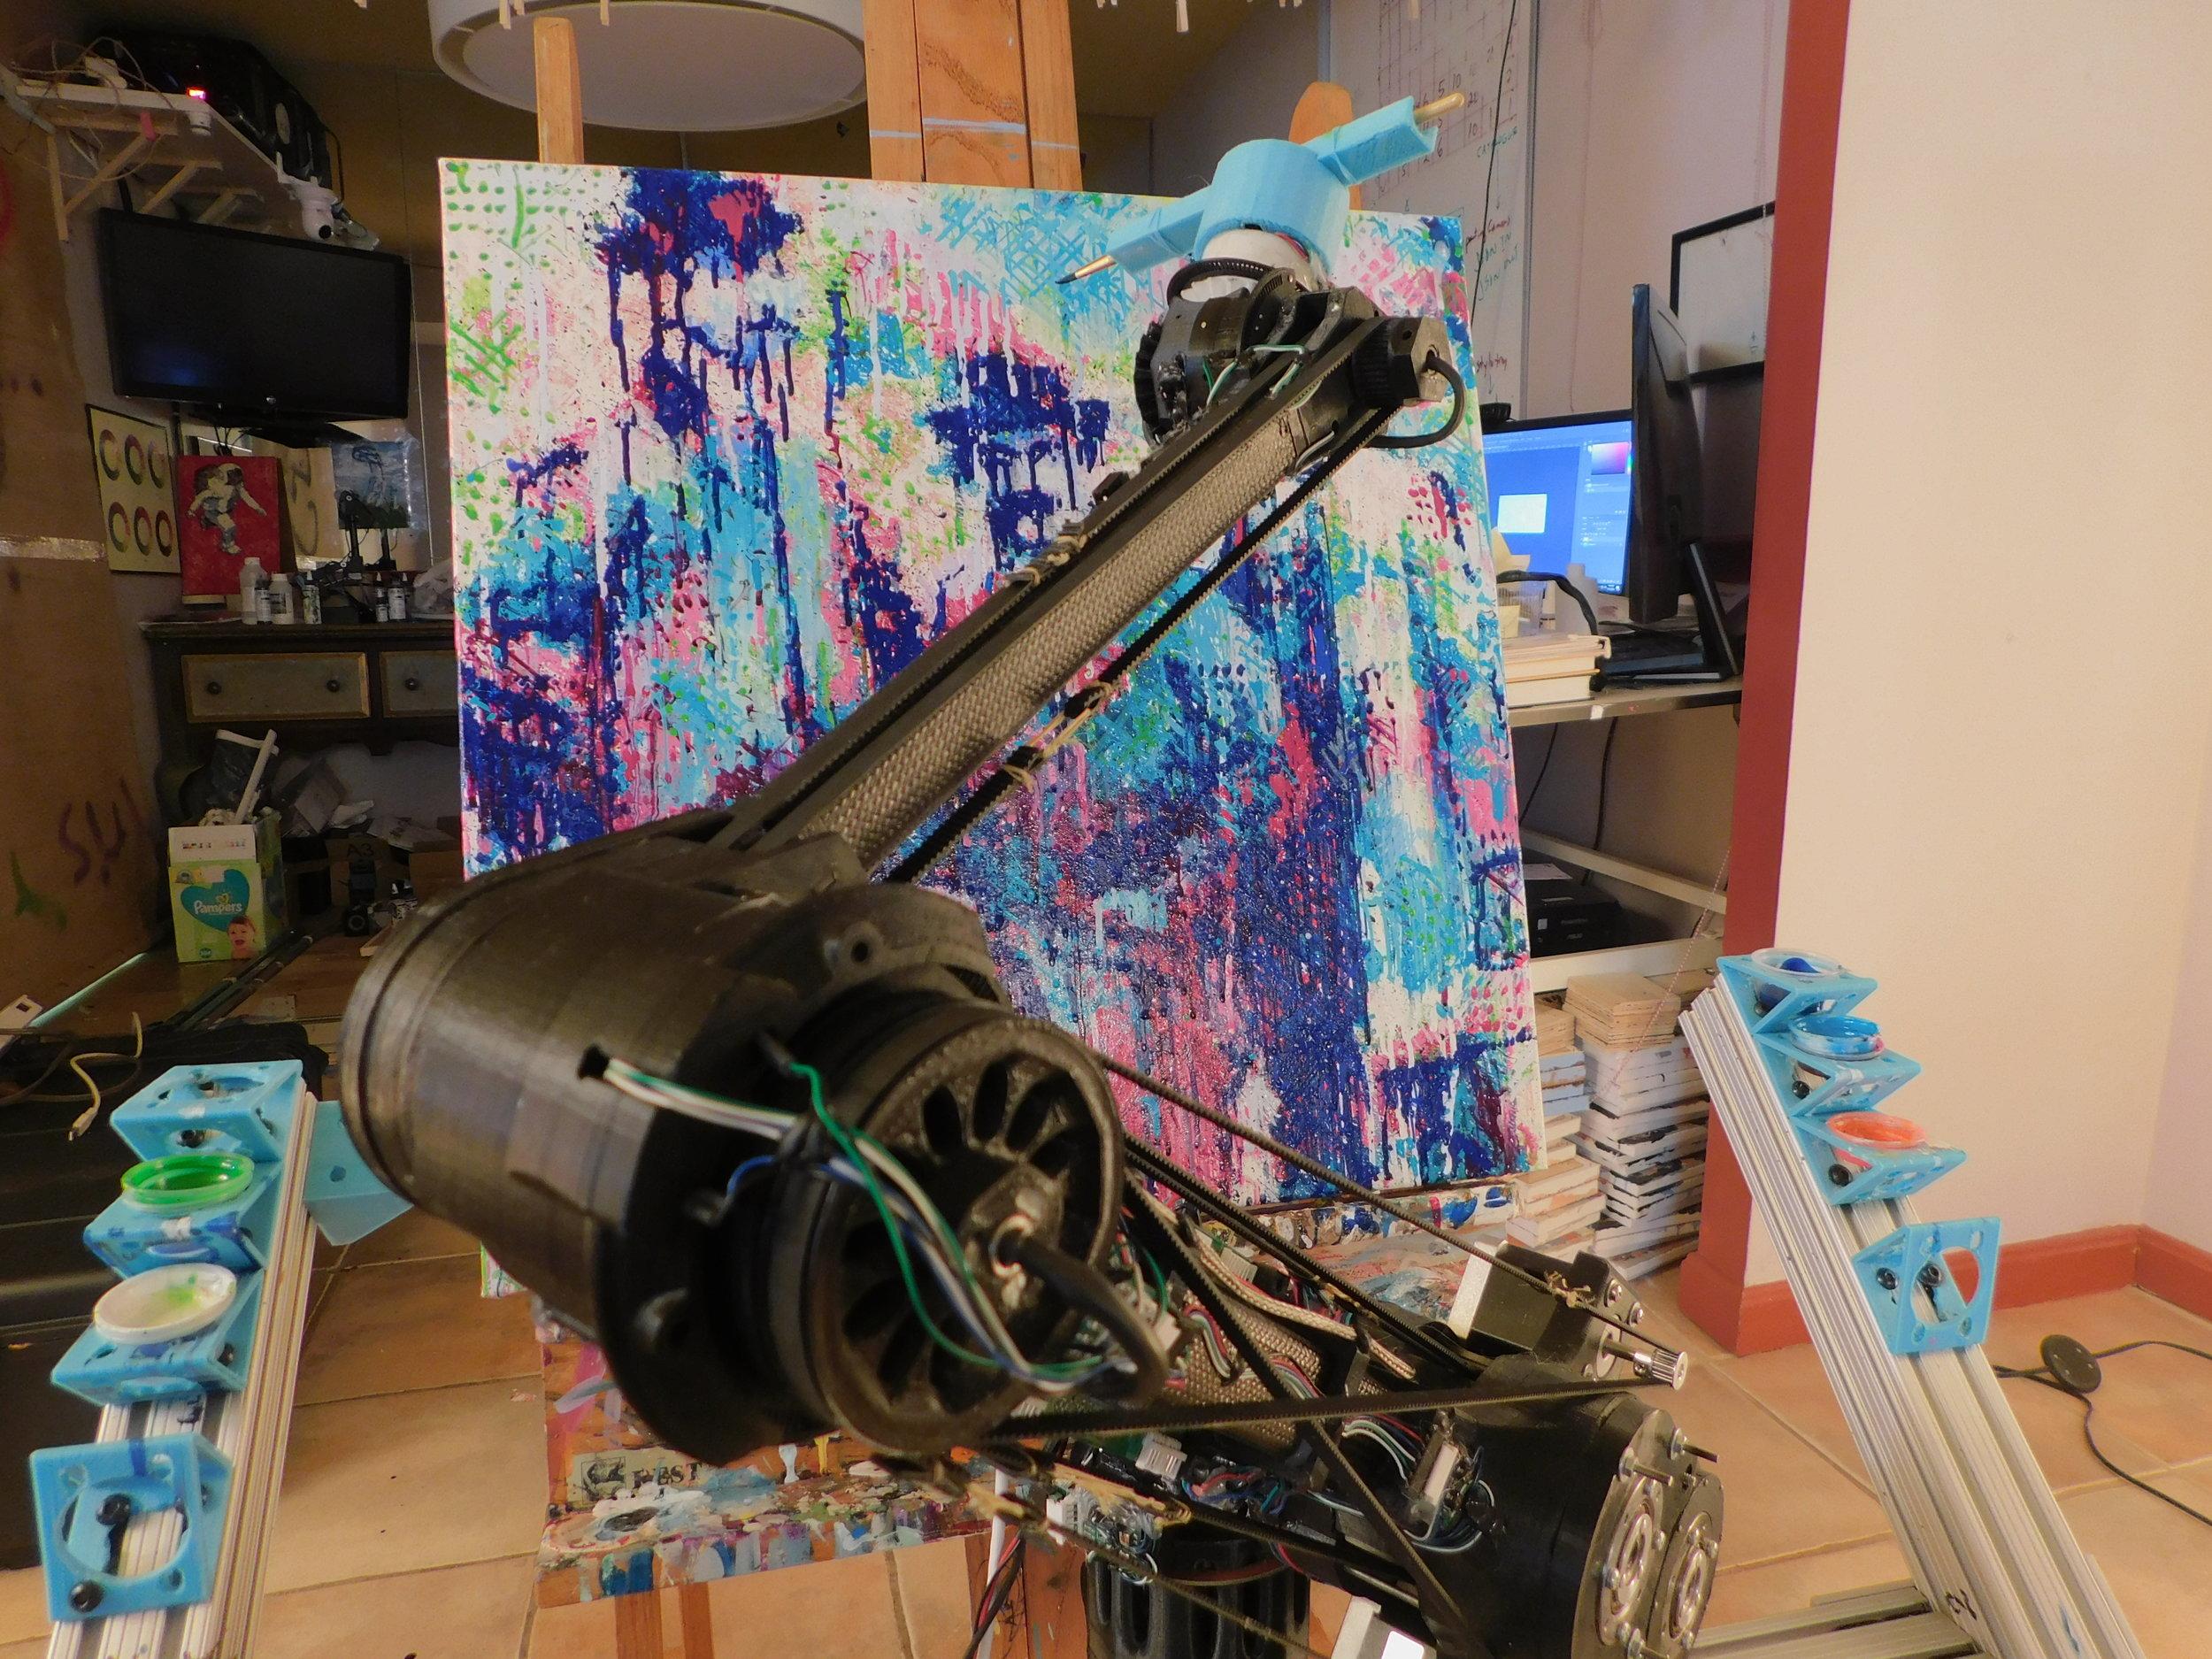 gallery04_robot.JPG